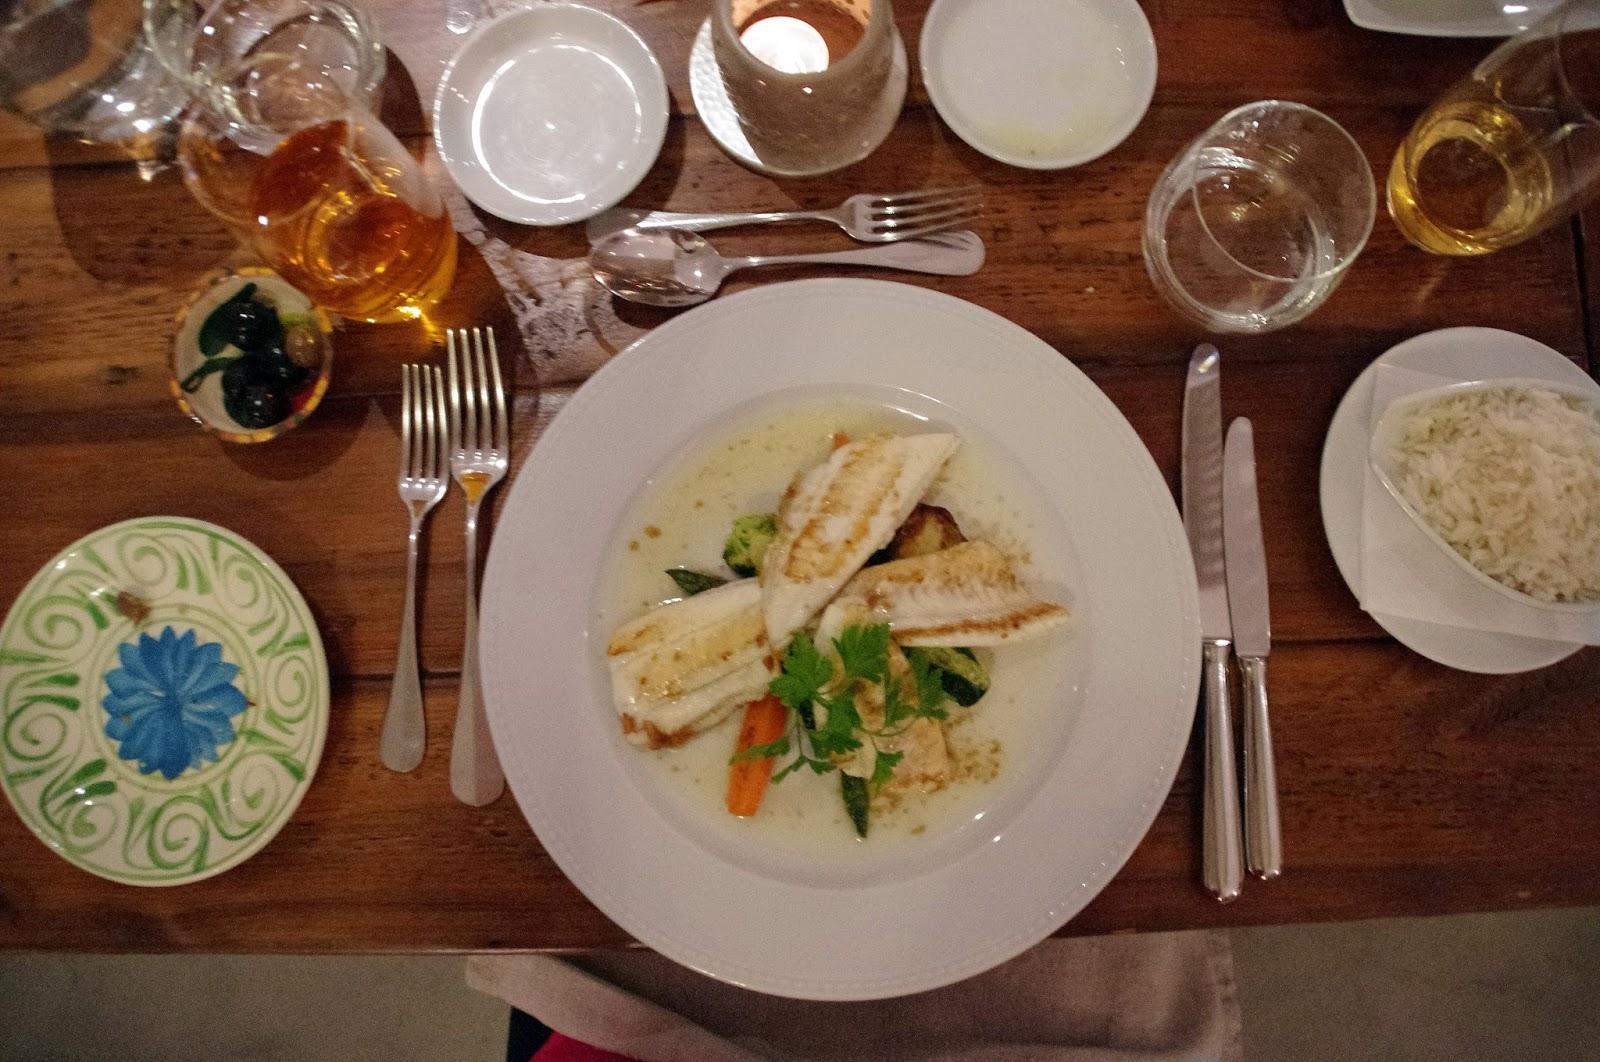 Seafood dinner at Fazenda Nova Country House